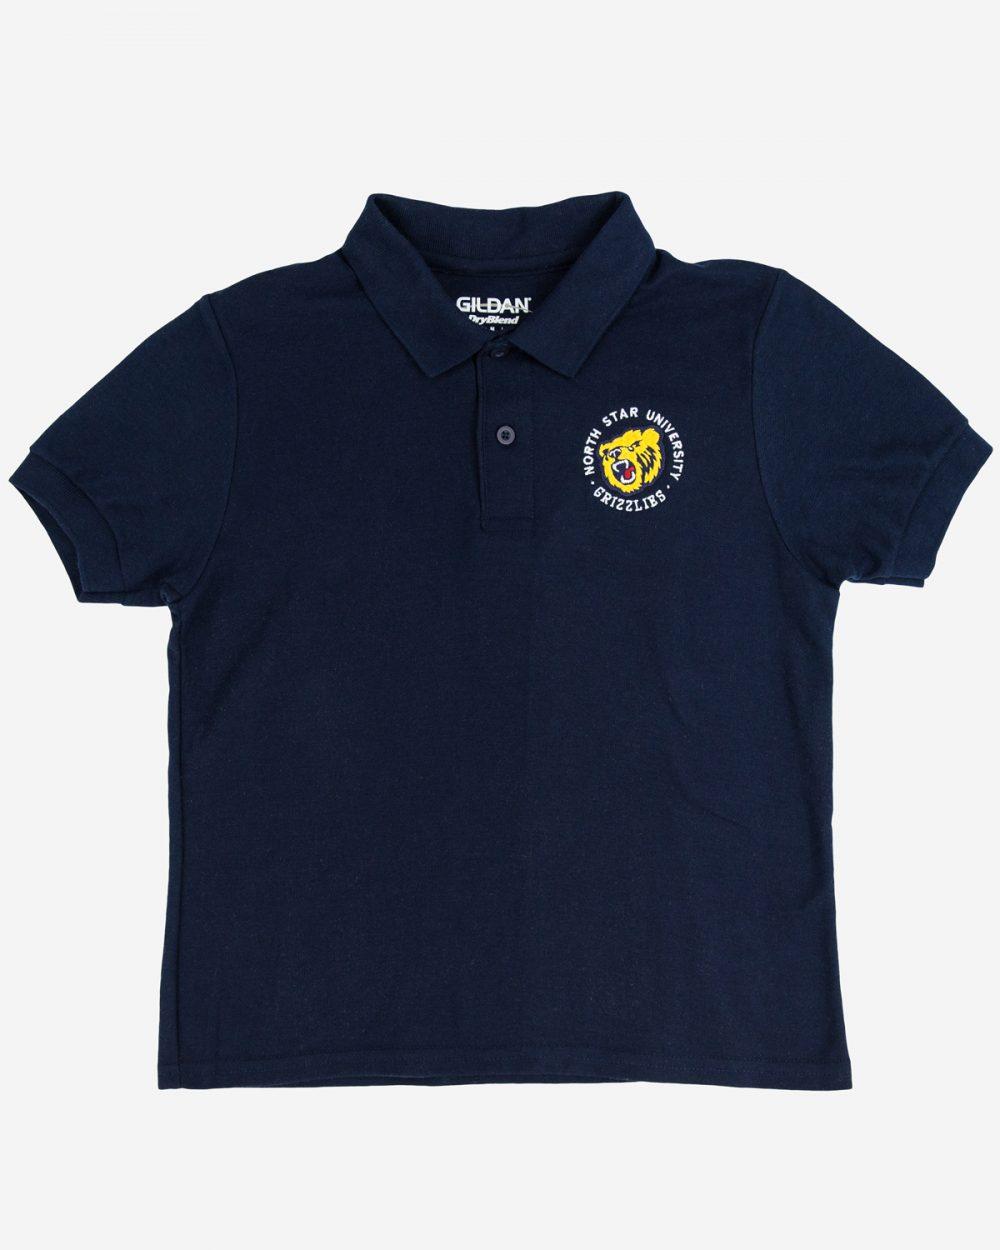 Signature Youth Golf Shirt